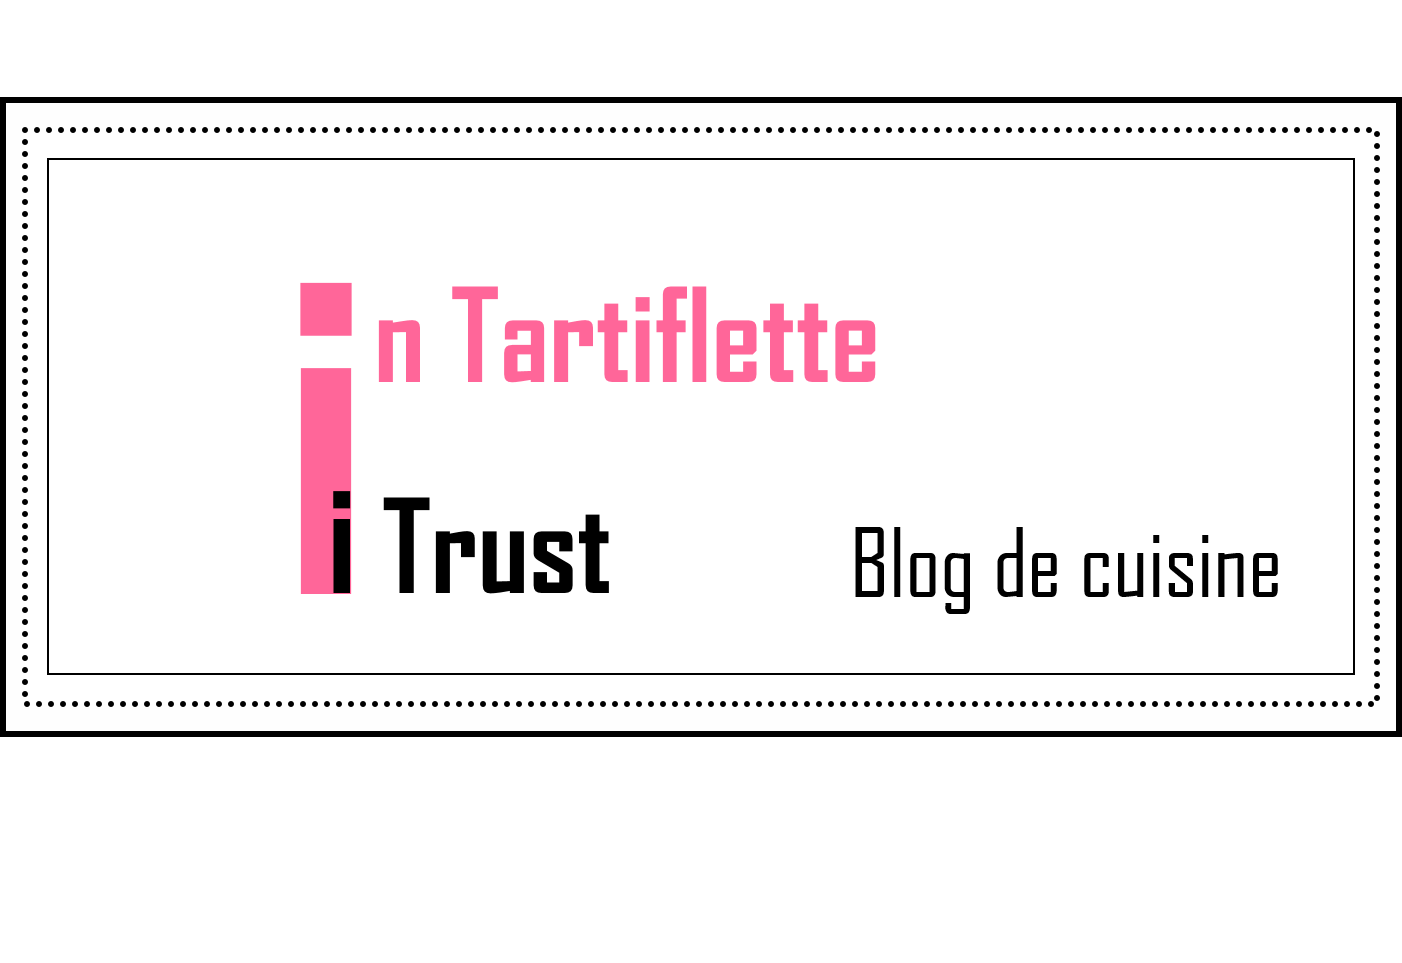 In Tartiflette I Trust